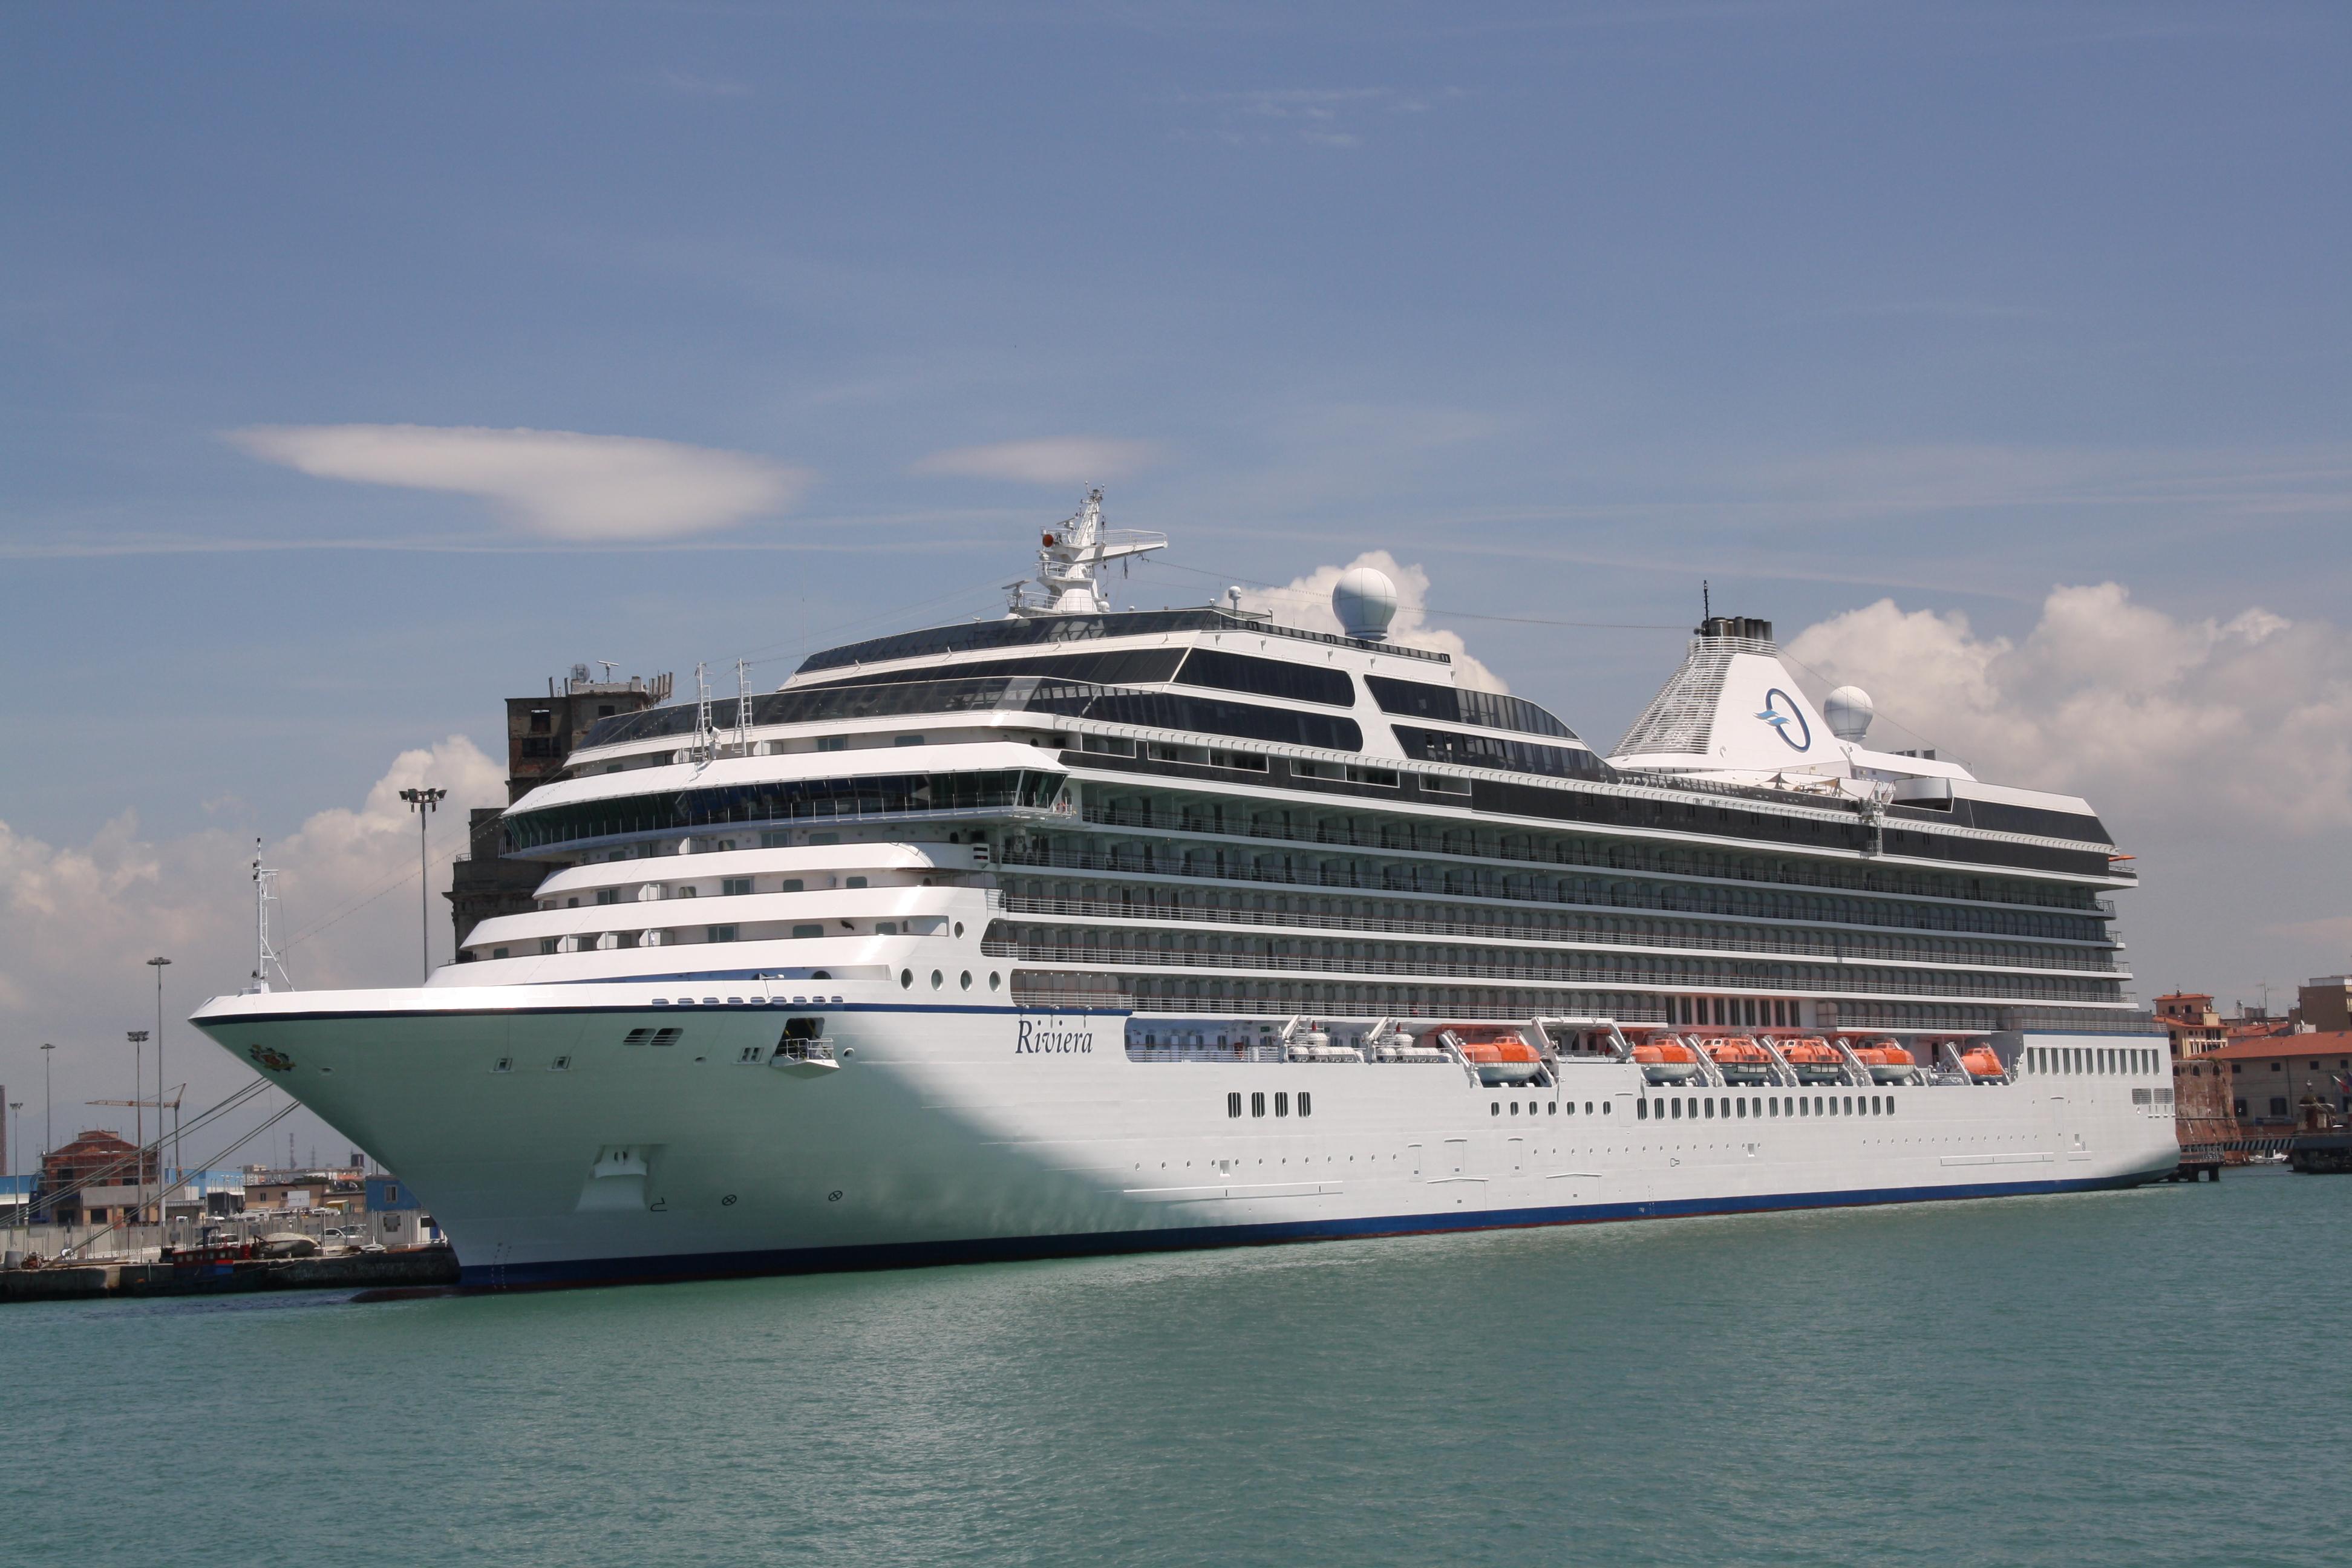 File:Oceania Cruises Riviera 01.JPG - Wikimedia Commons